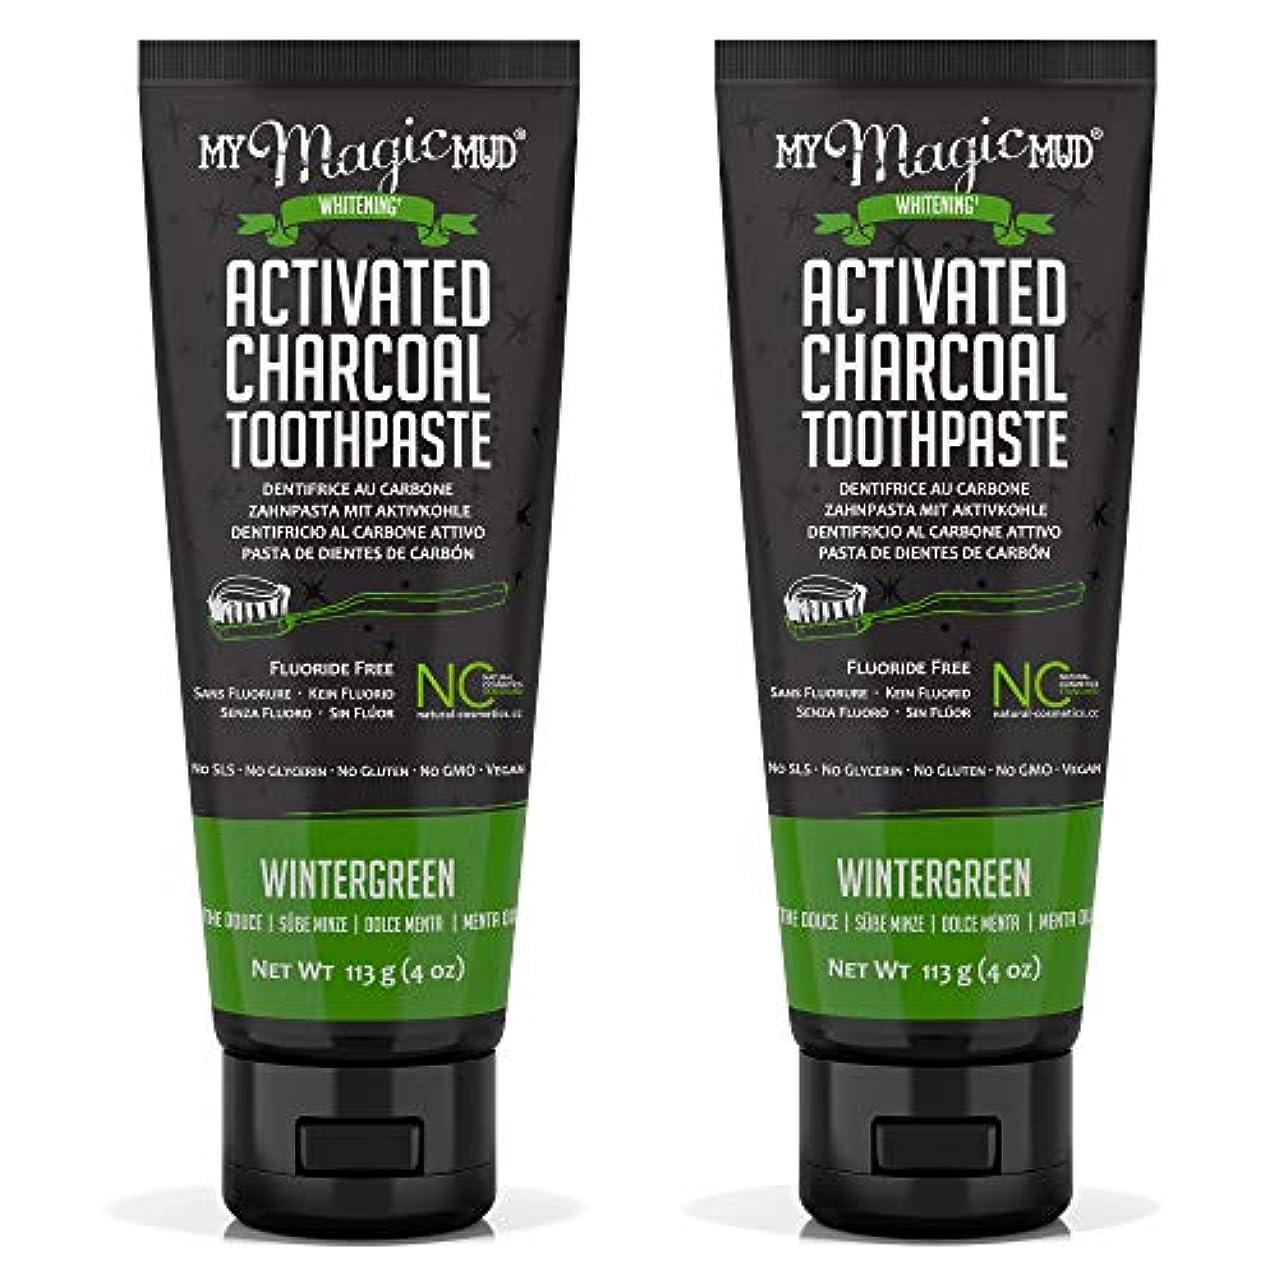 指共産主義屋内My Magic Mud Activated Charcoal Toothpaste (Fluoride-Free) - Wintergreen 113g/4oz並行輸入品